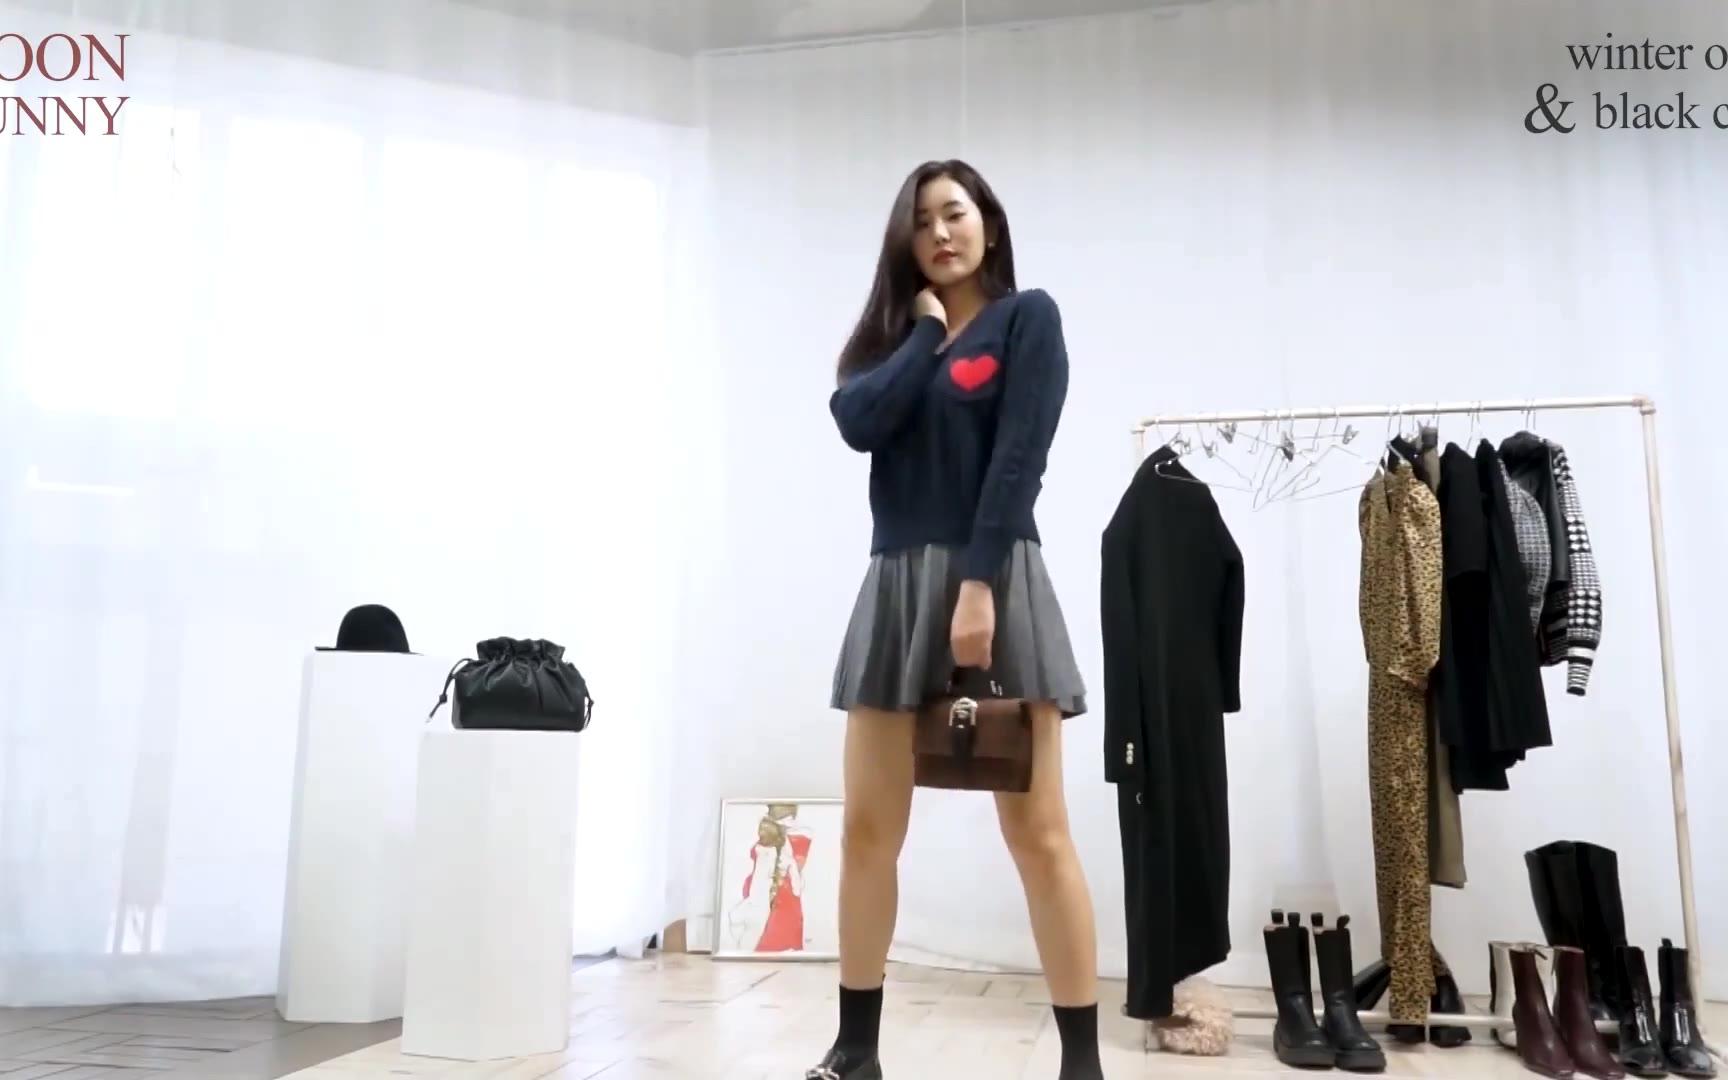 yoonsunny合集 _ LOOKBOOK _ 172cm 55kg